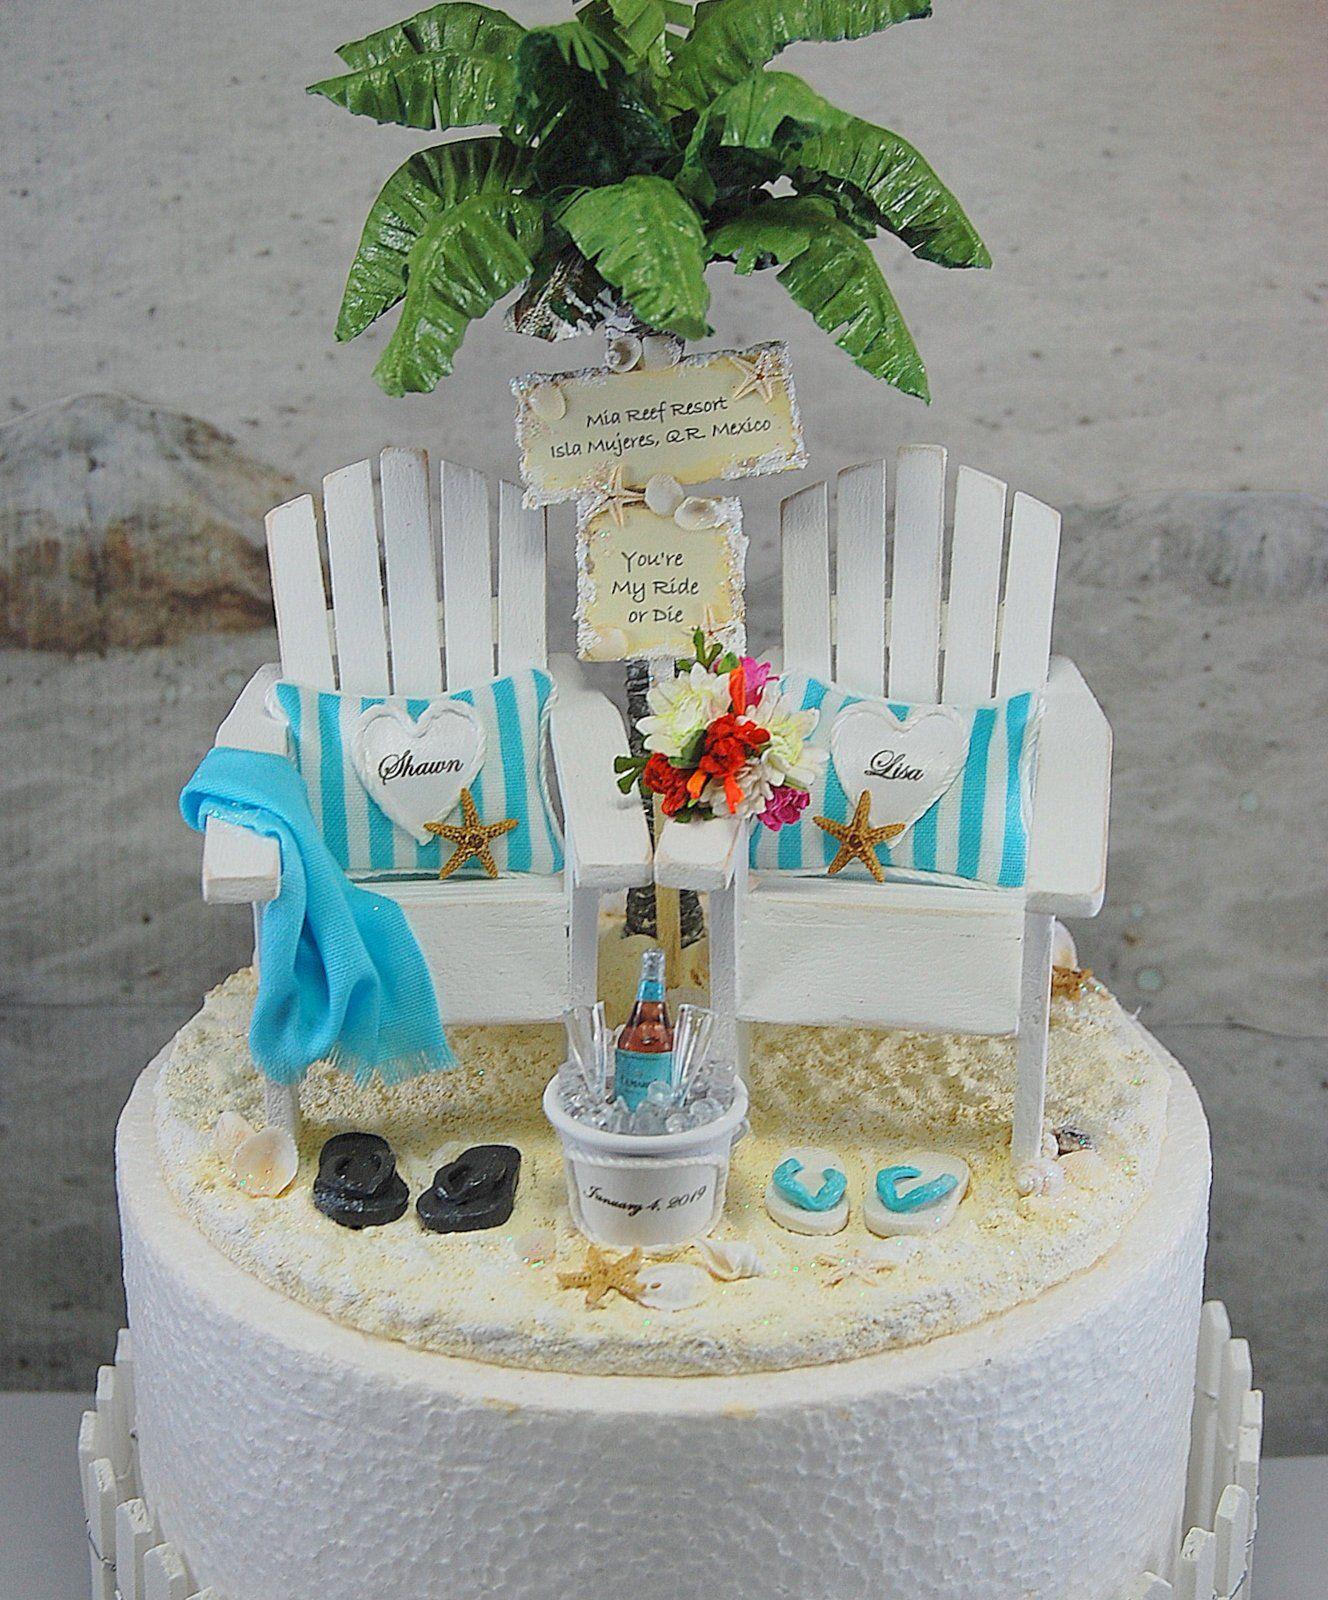 Beach Wedding 6 Inch Cake Topper Custom Colors 6 Inch Cake Base Handmade Personalized Adi Beach Wedding Cake Toppers Beach Wedding Cake Wedding Cake Toppers